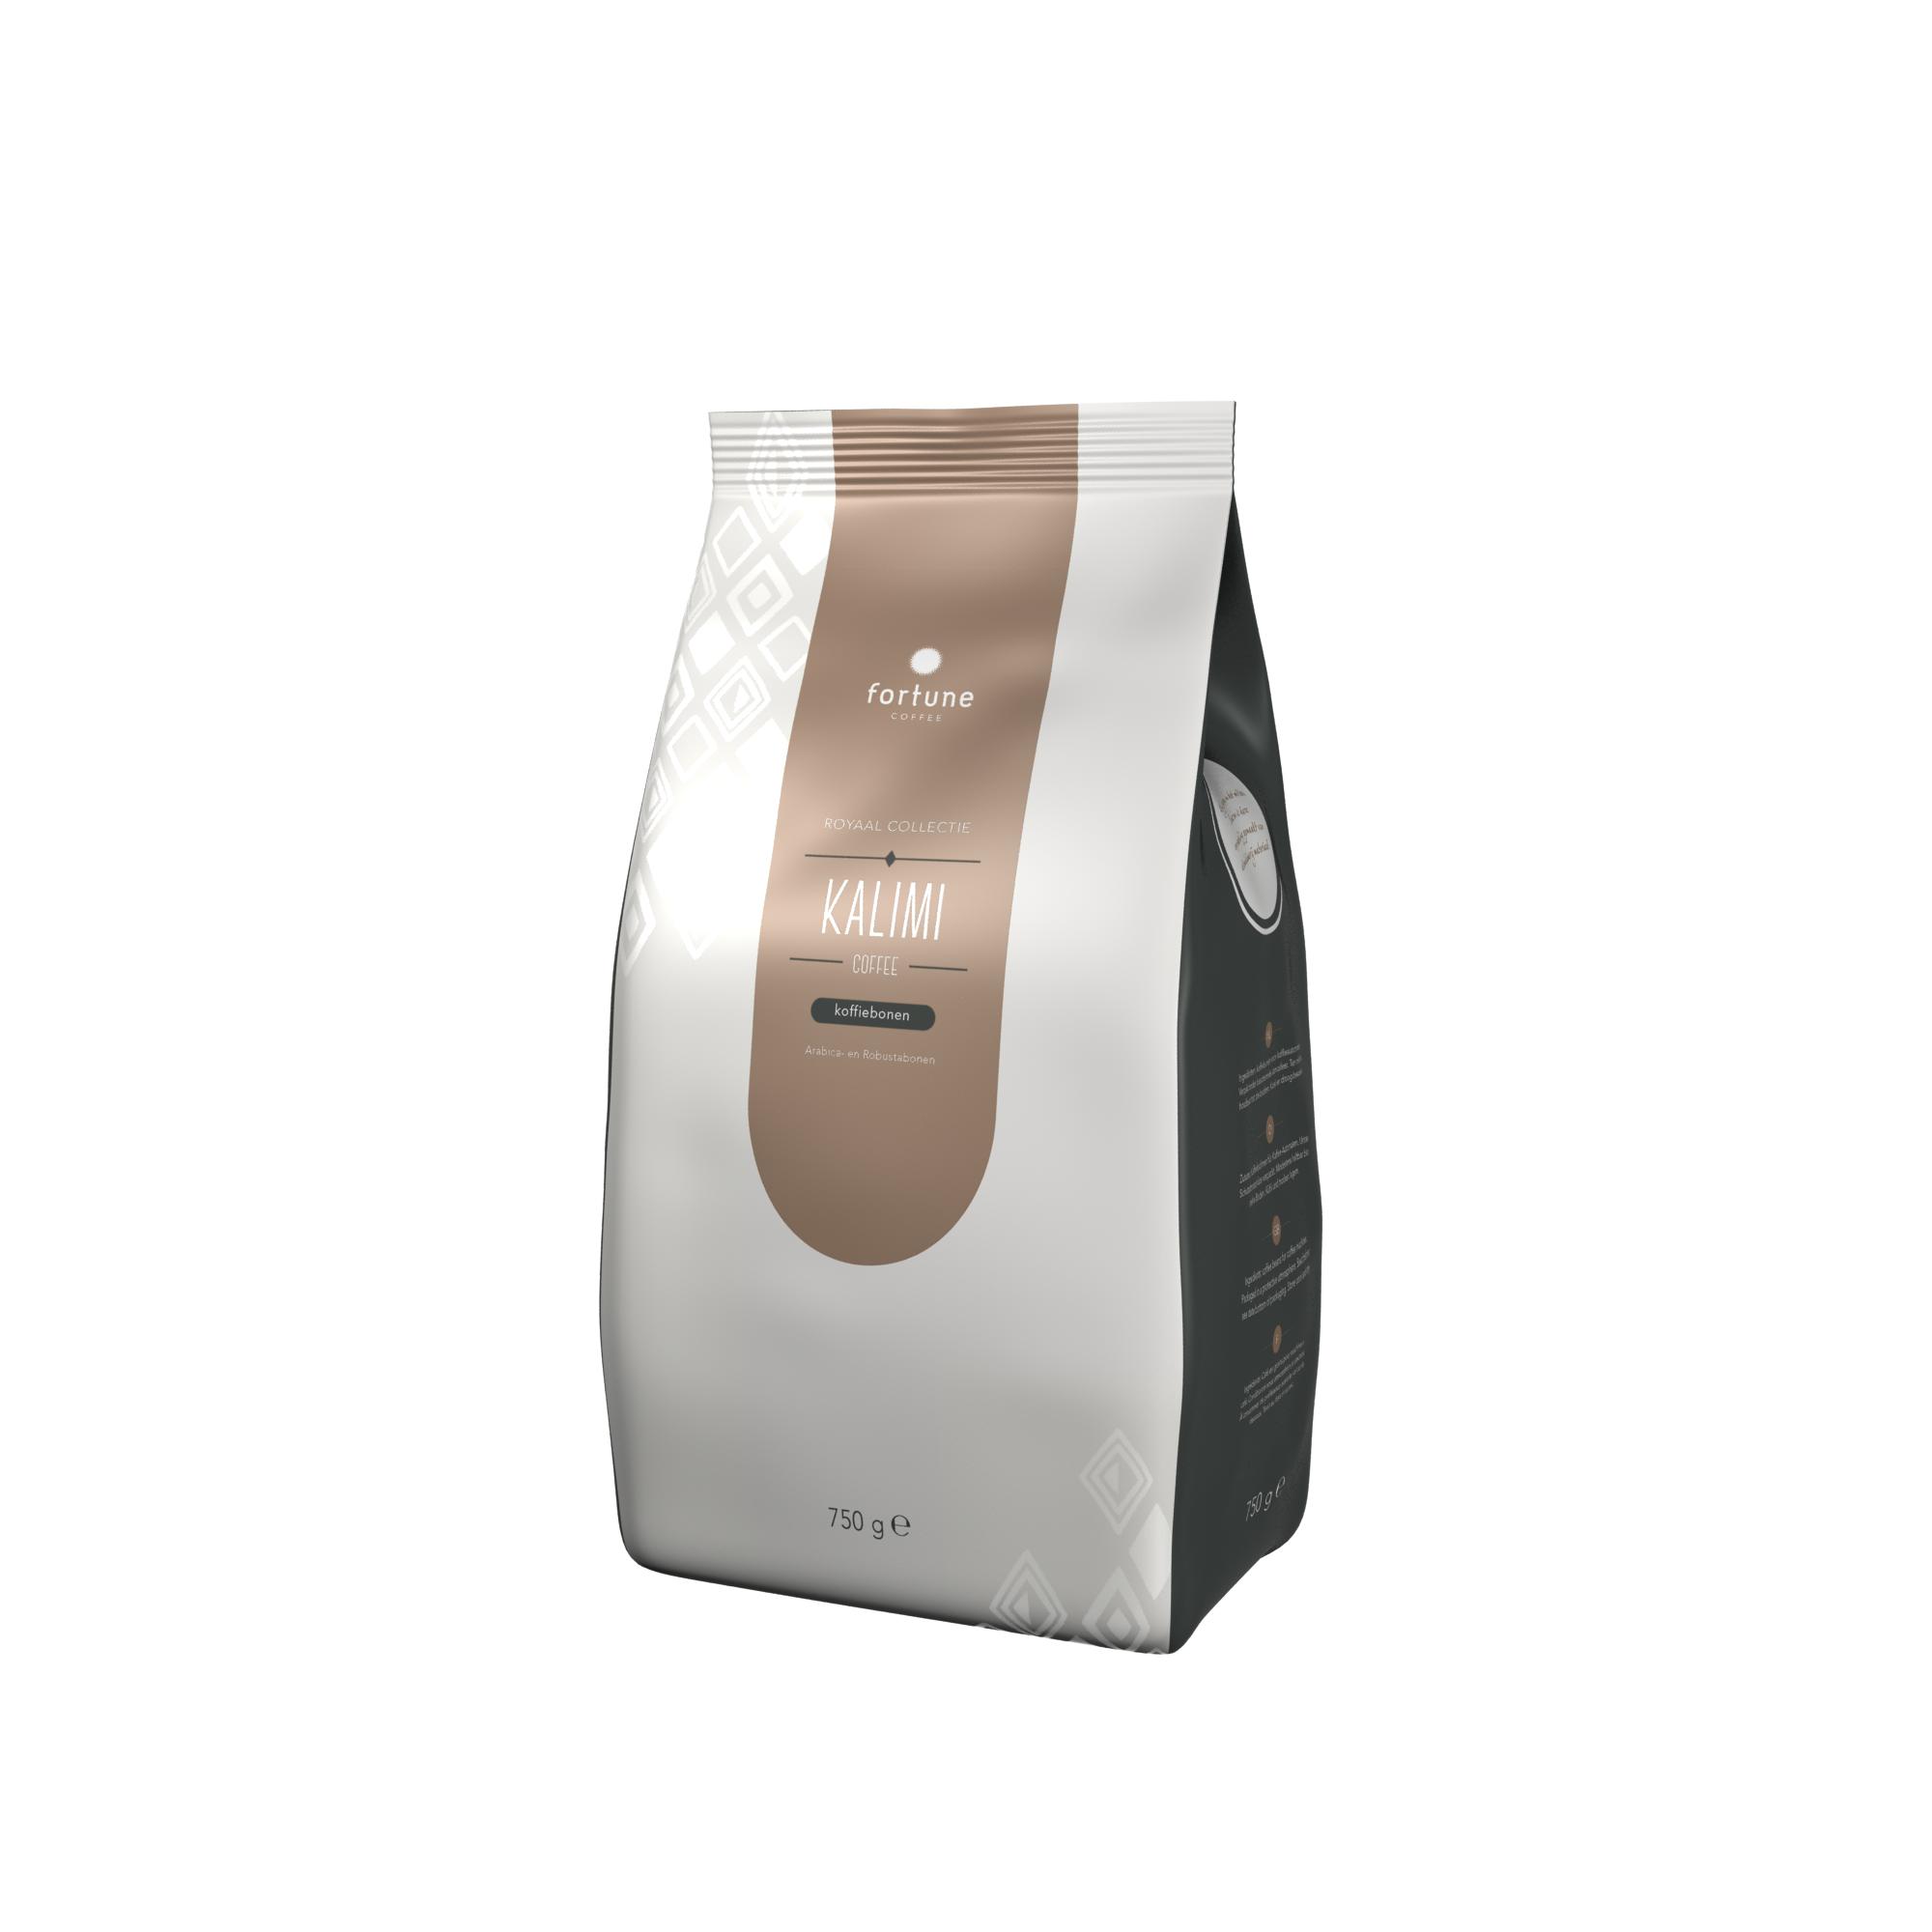 Onze favoriet: Kalimi Coffee